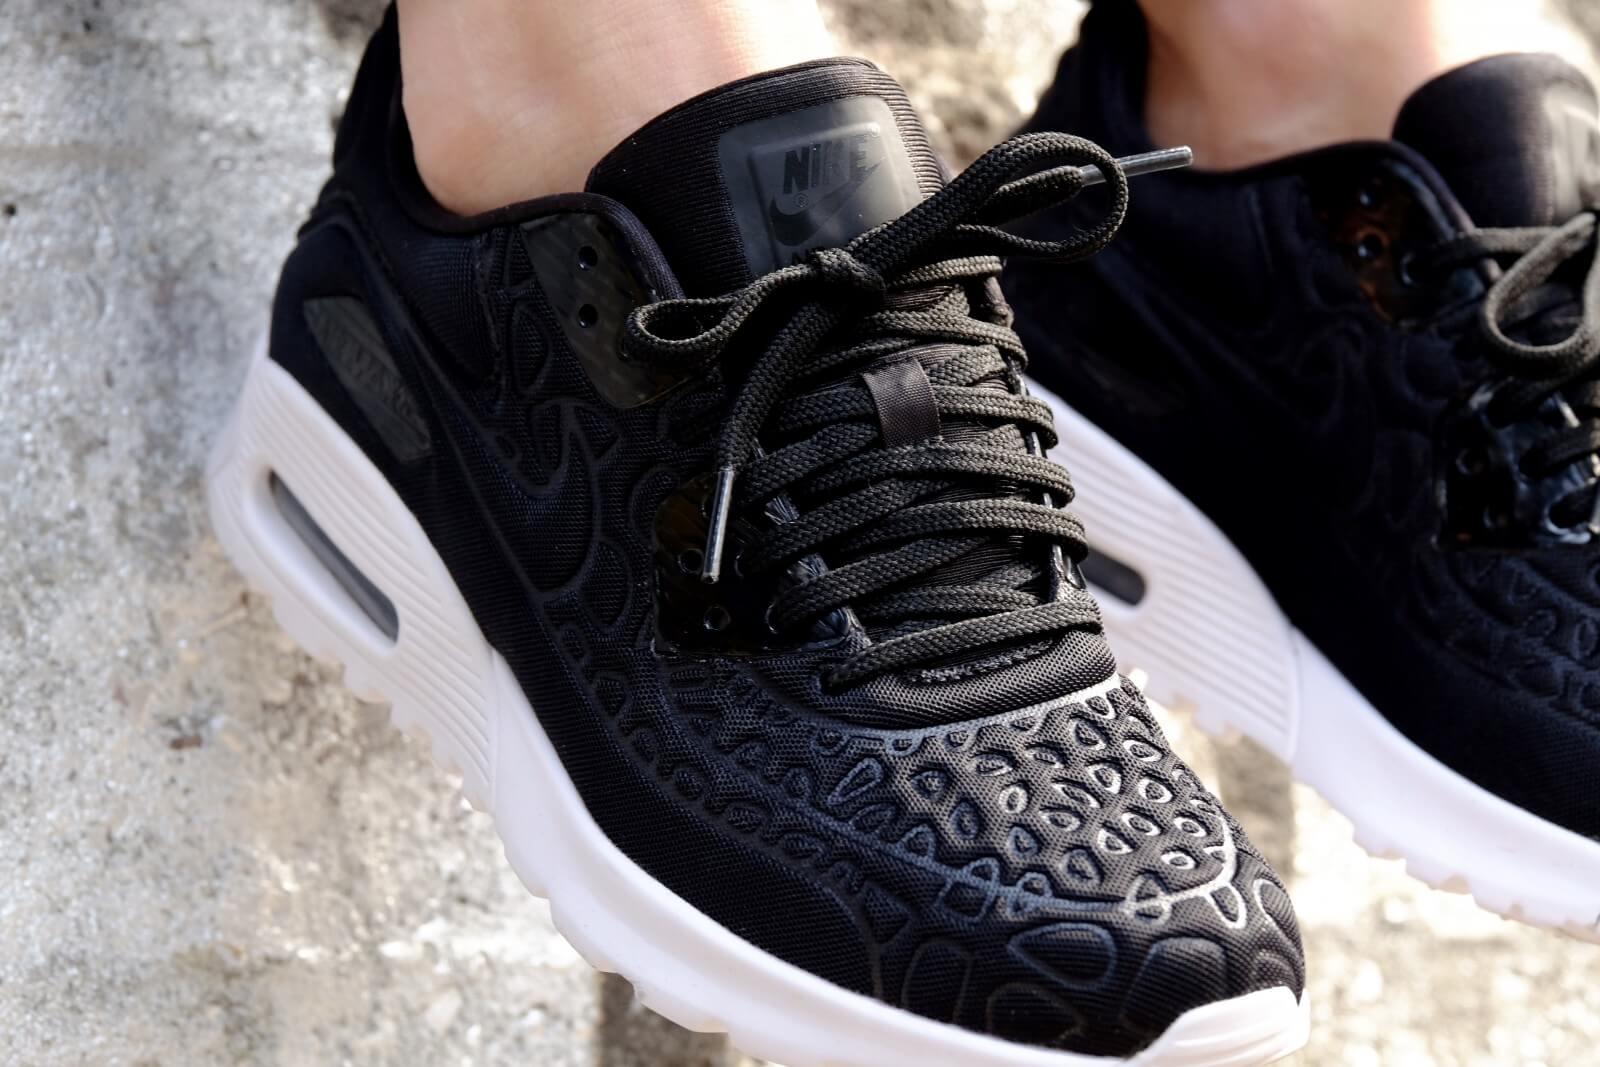 Nike WMNS Air Max 90 Ultra Plush Black/Black-White